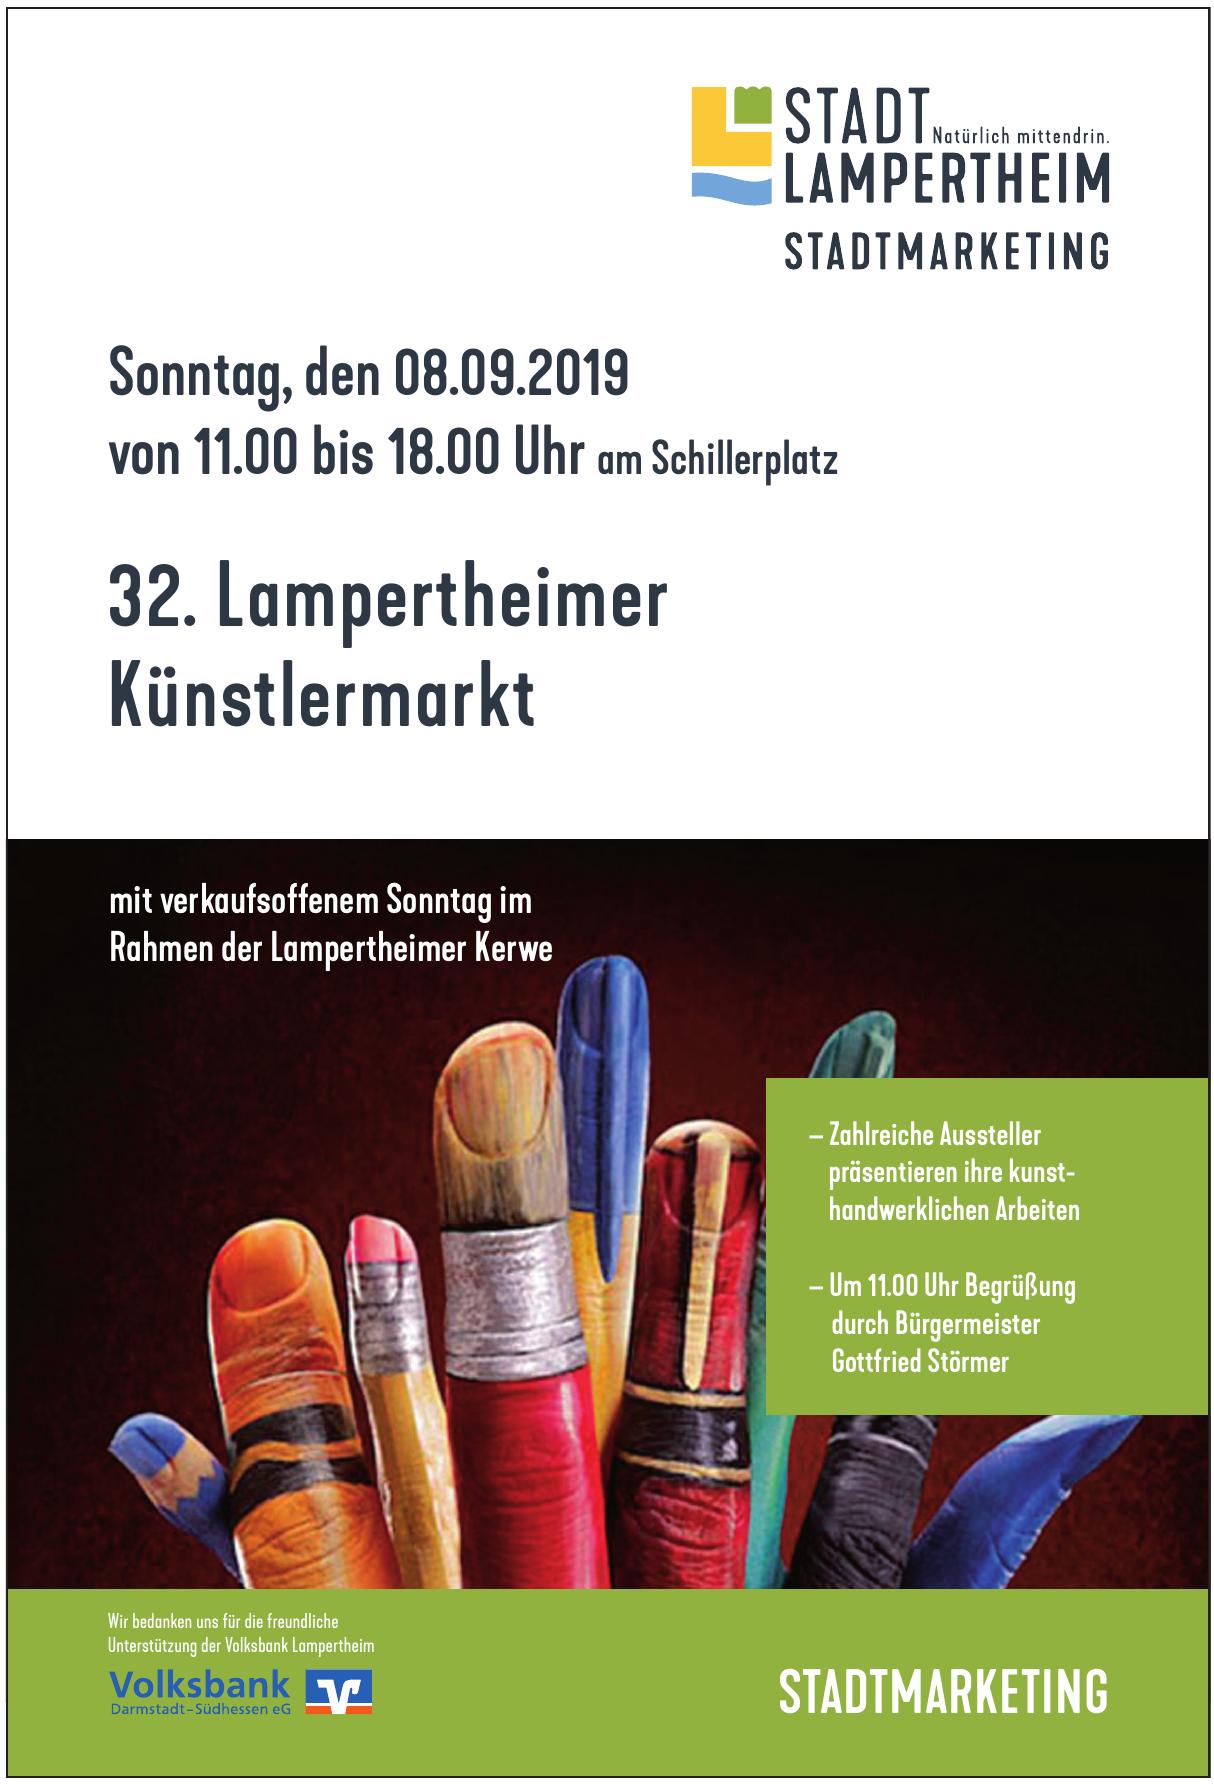 Stadt Lampertheim Stadtmarketing